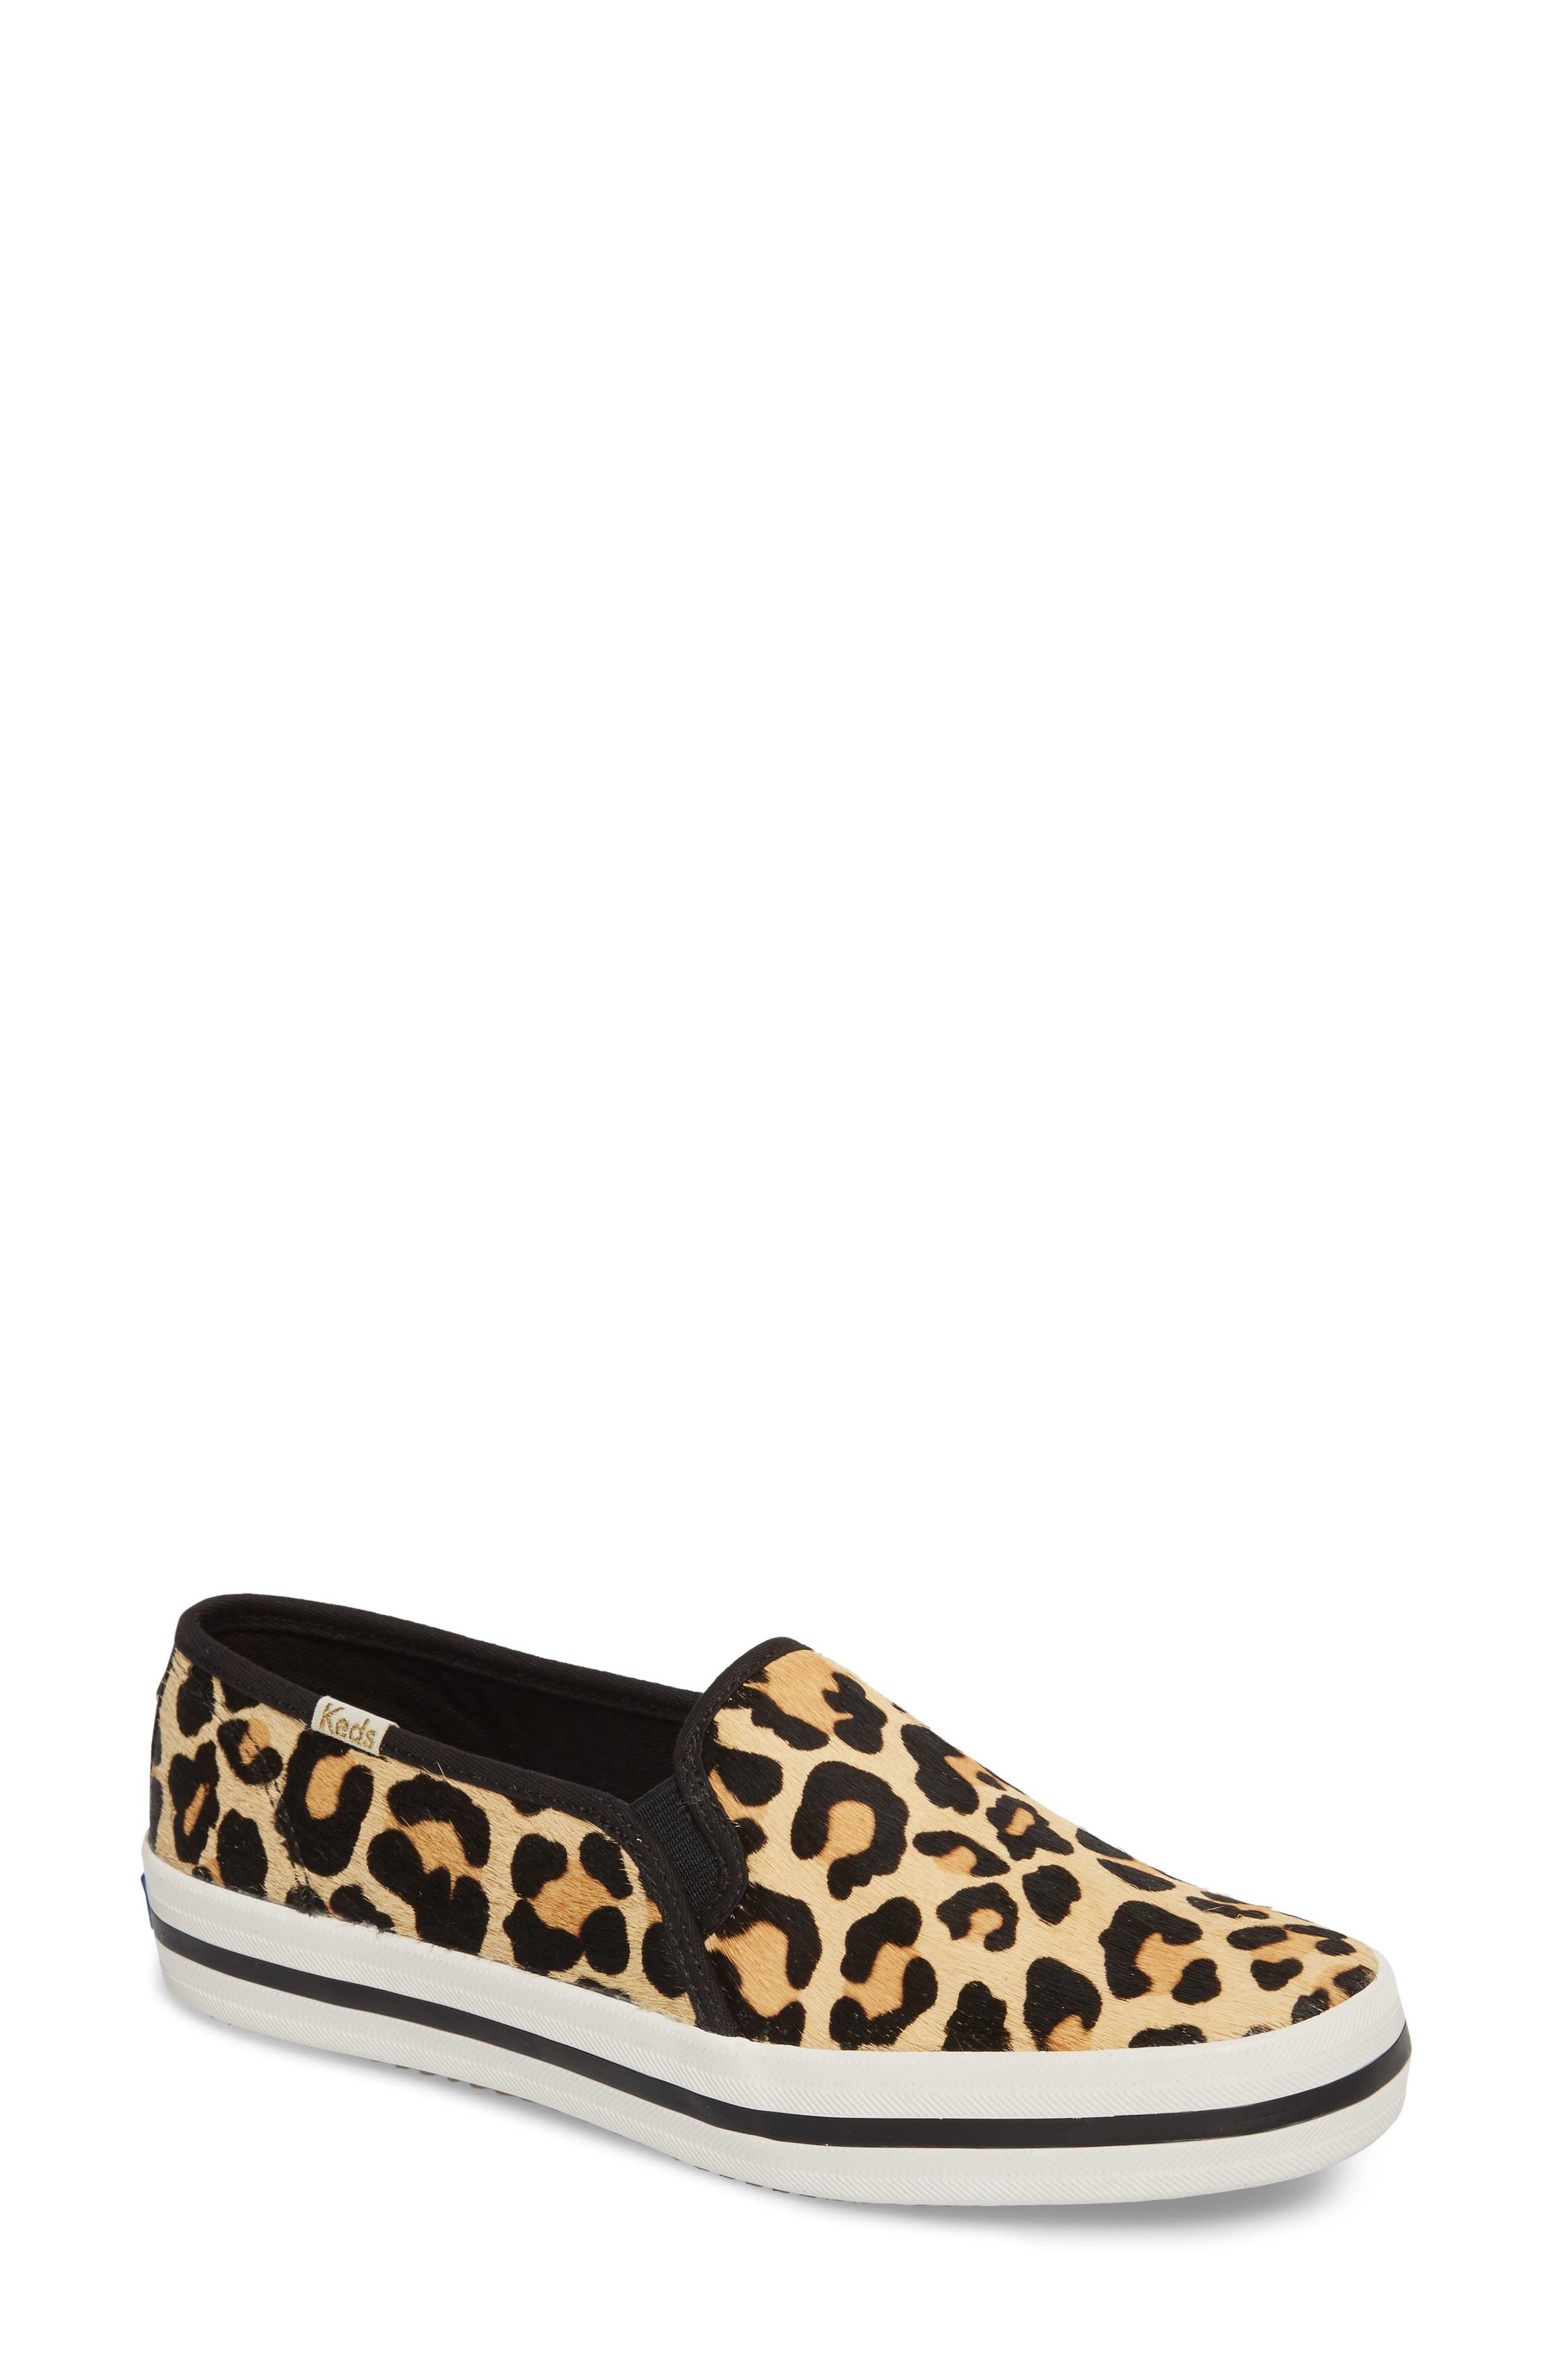 Keds<sup>®</sup> x kate spade Double Decker Slip-On Sneaker,                             Main thumbnail 1, color,                             Tan Pony Hair